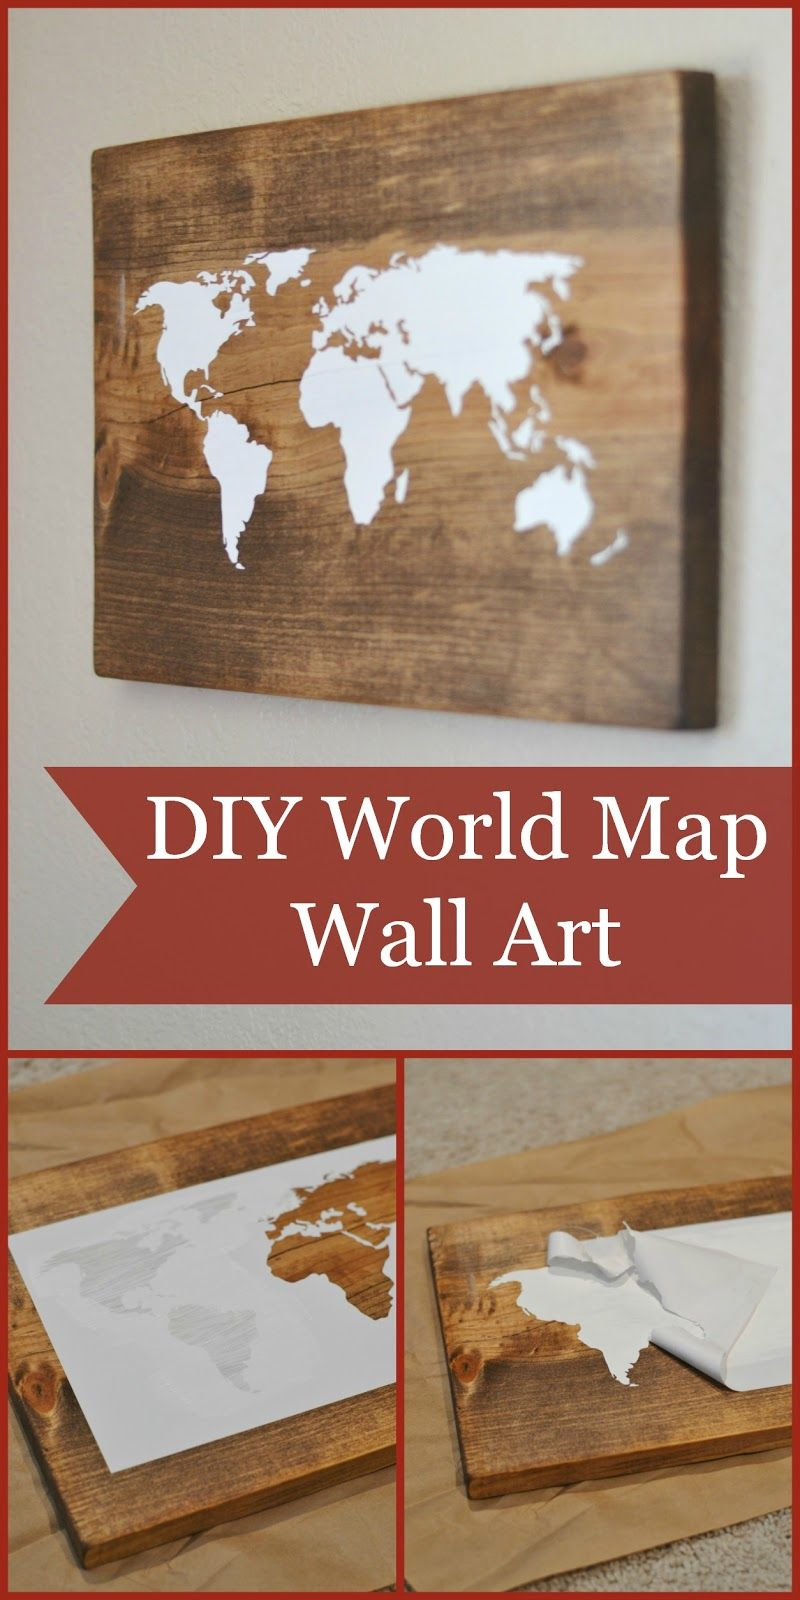 DIY World Map Wall Art Tutorial using